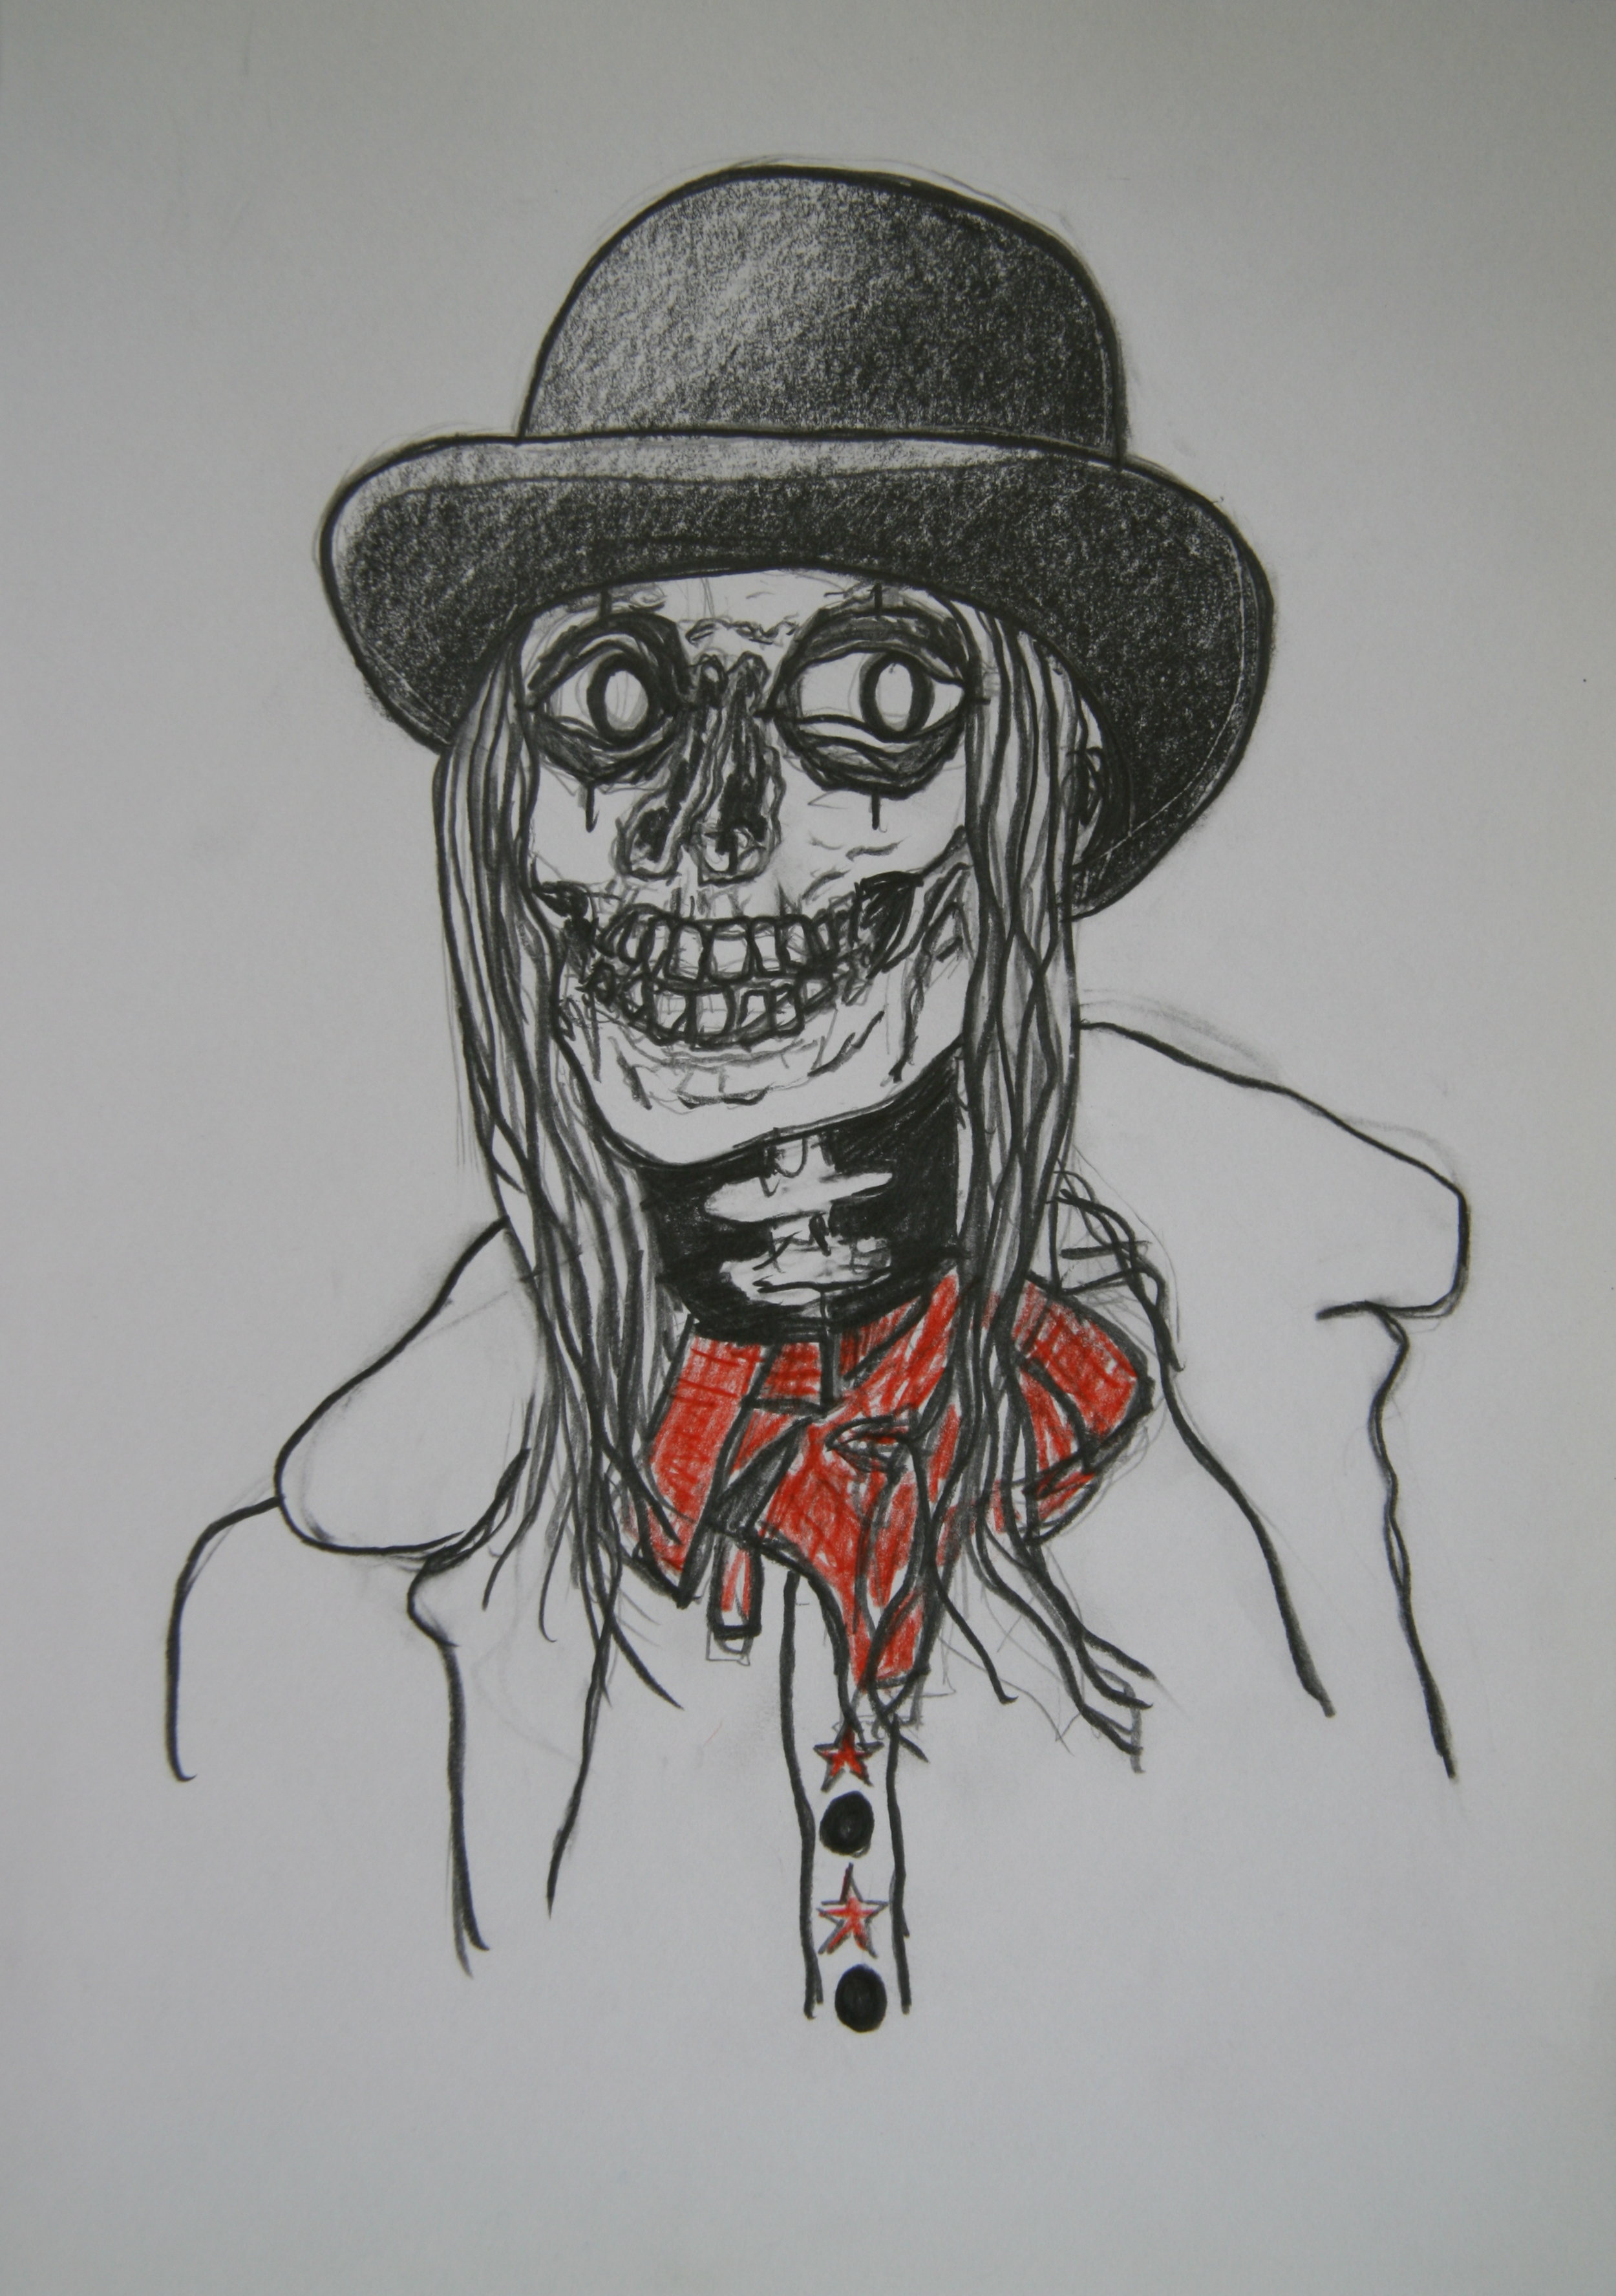 Skull 1, 30x21cm, pencil on paper